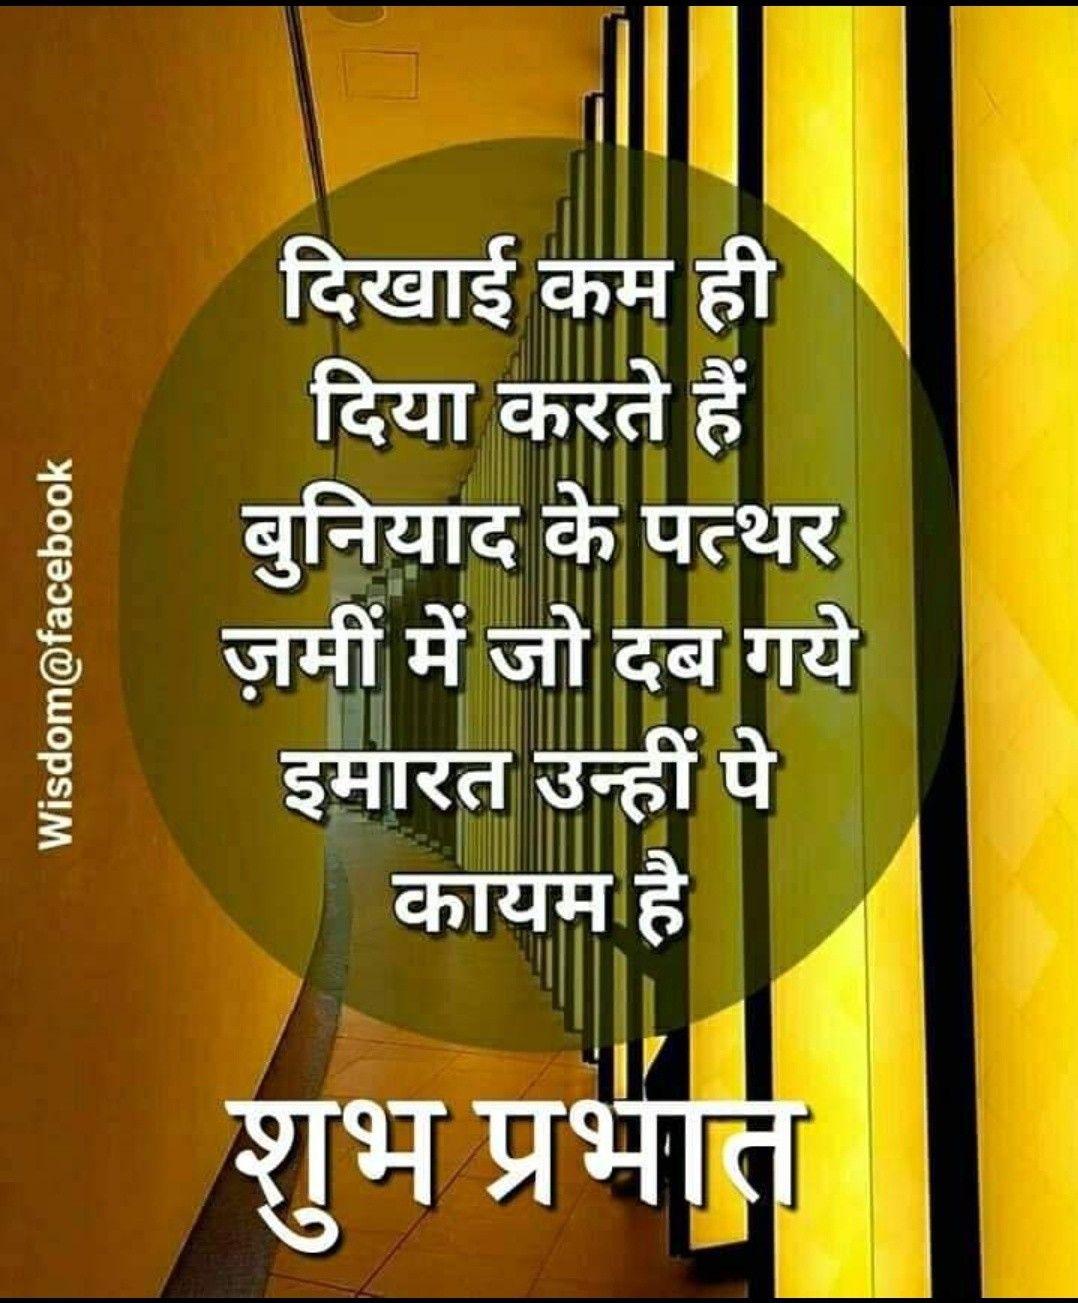 Pin by mrinalini ghosh on Morning prayer quotes   Gd morning